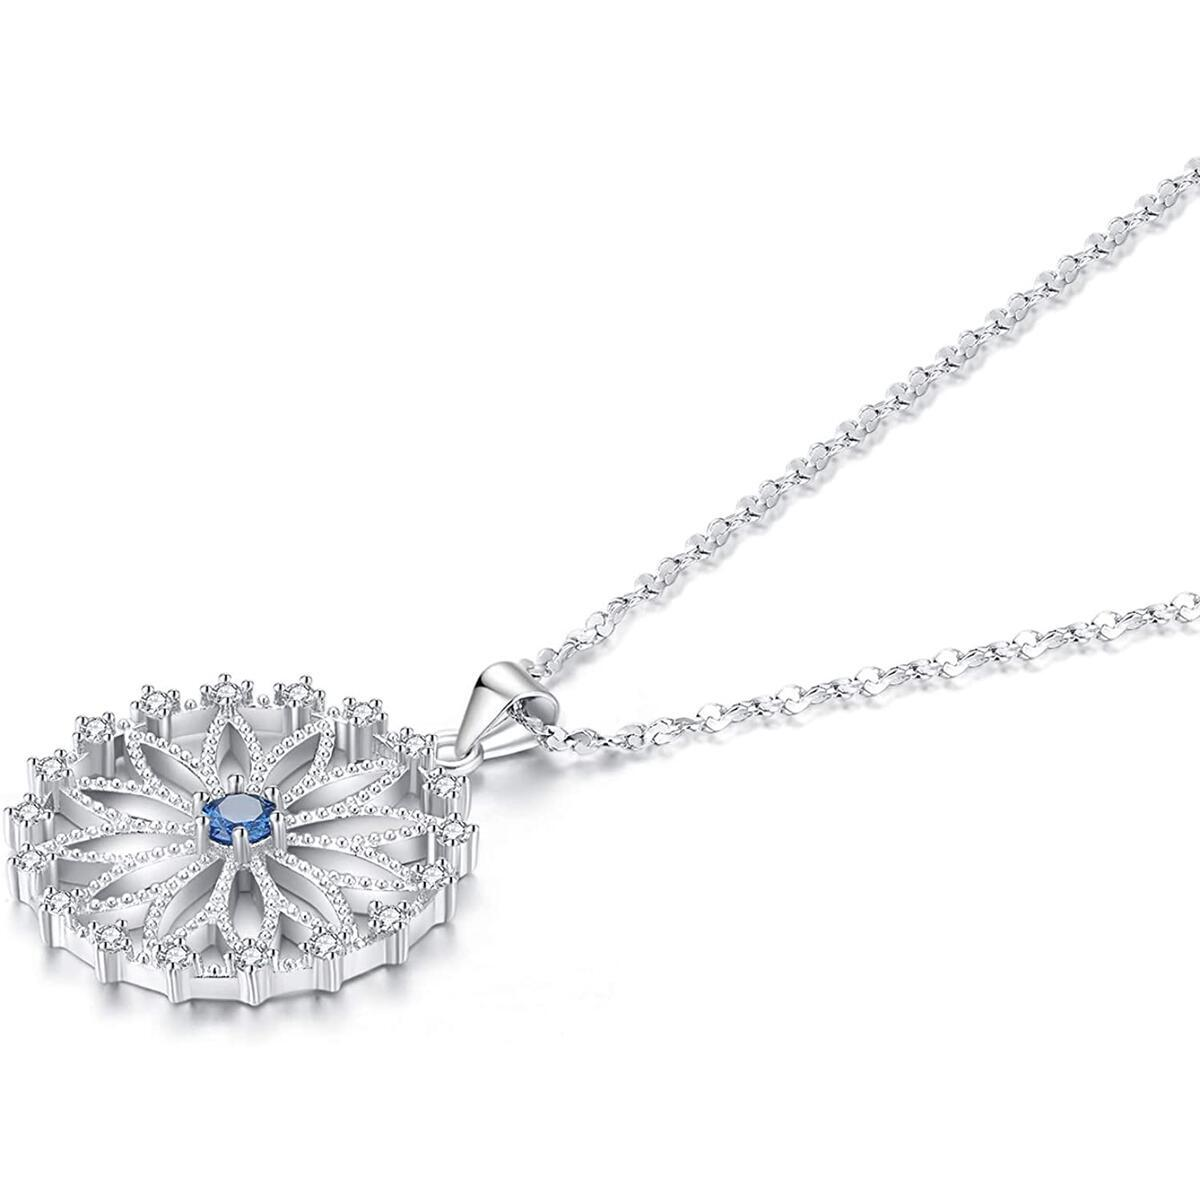 Round Necklace White Diamond Ladies Circle Necklace Ferris Wheel Jewelry for Women